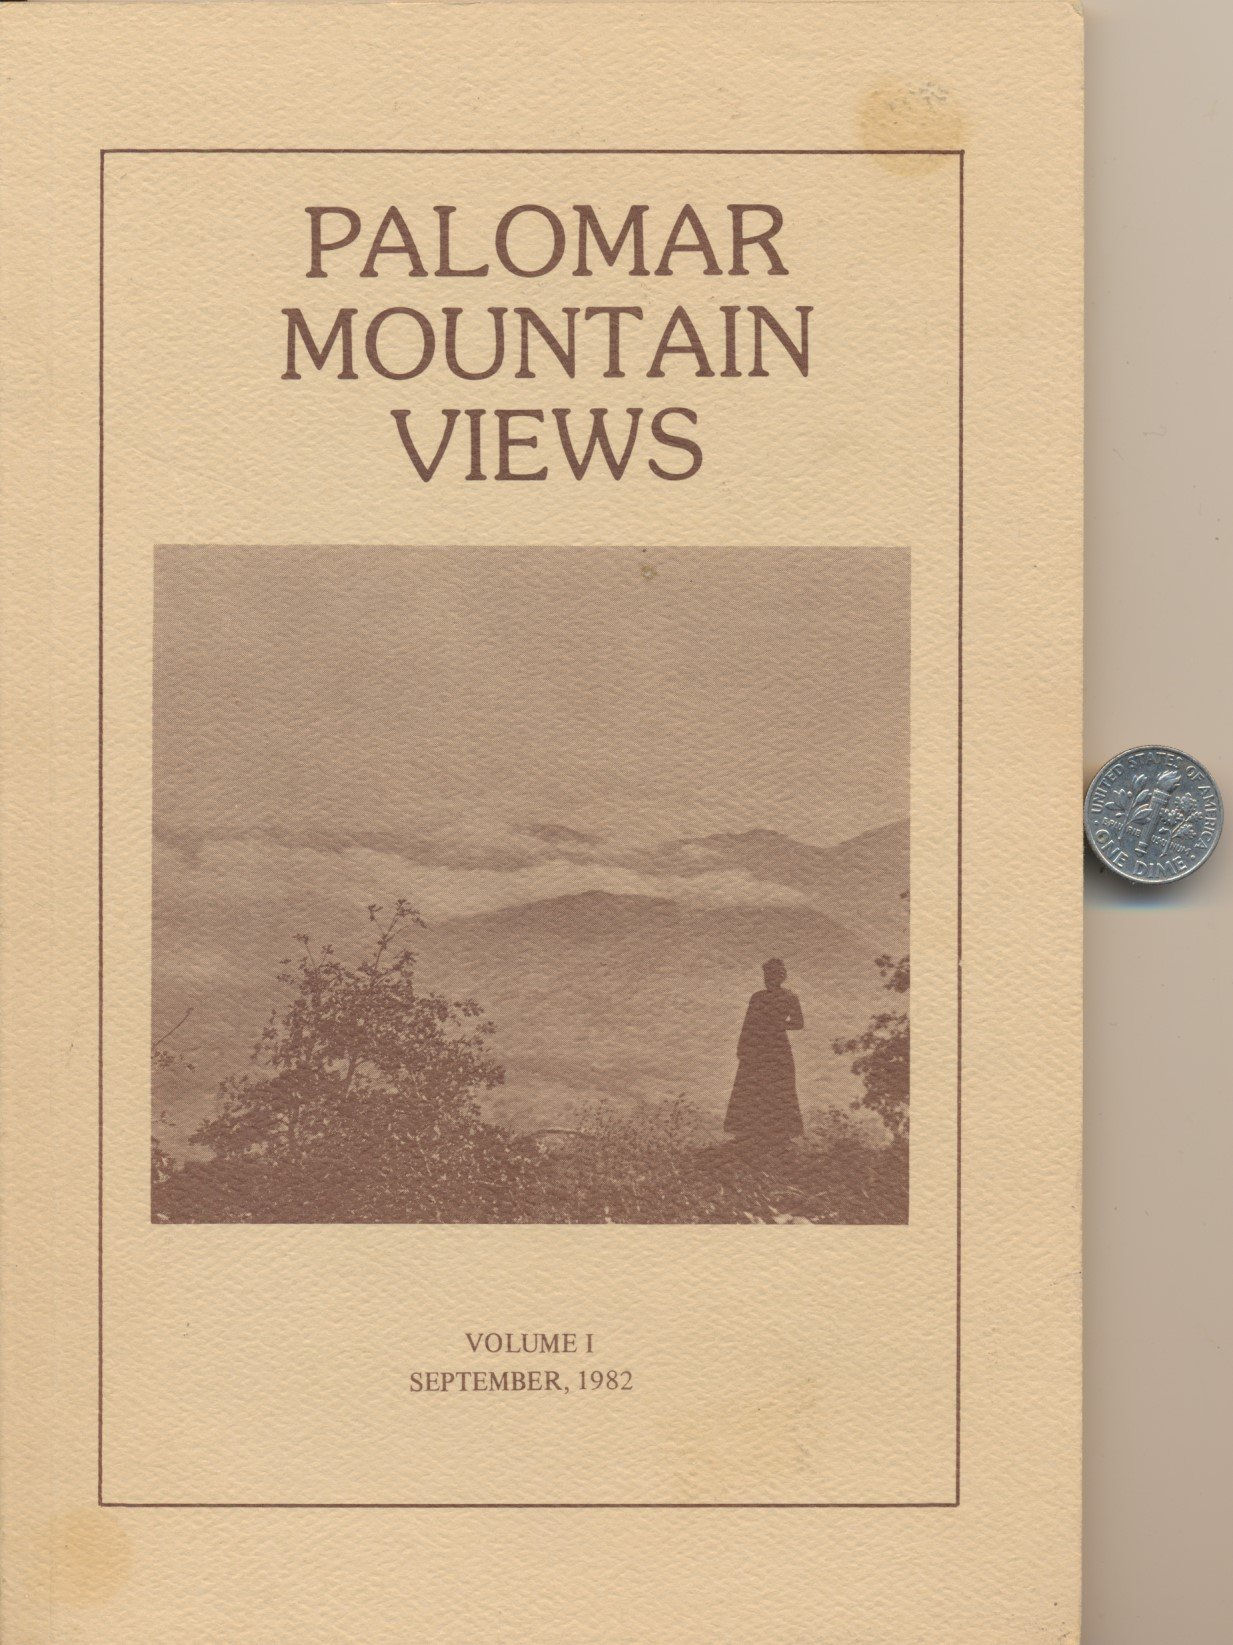 Palomar Mountain Views : Brief History of Palomar Mountain Fire Dept